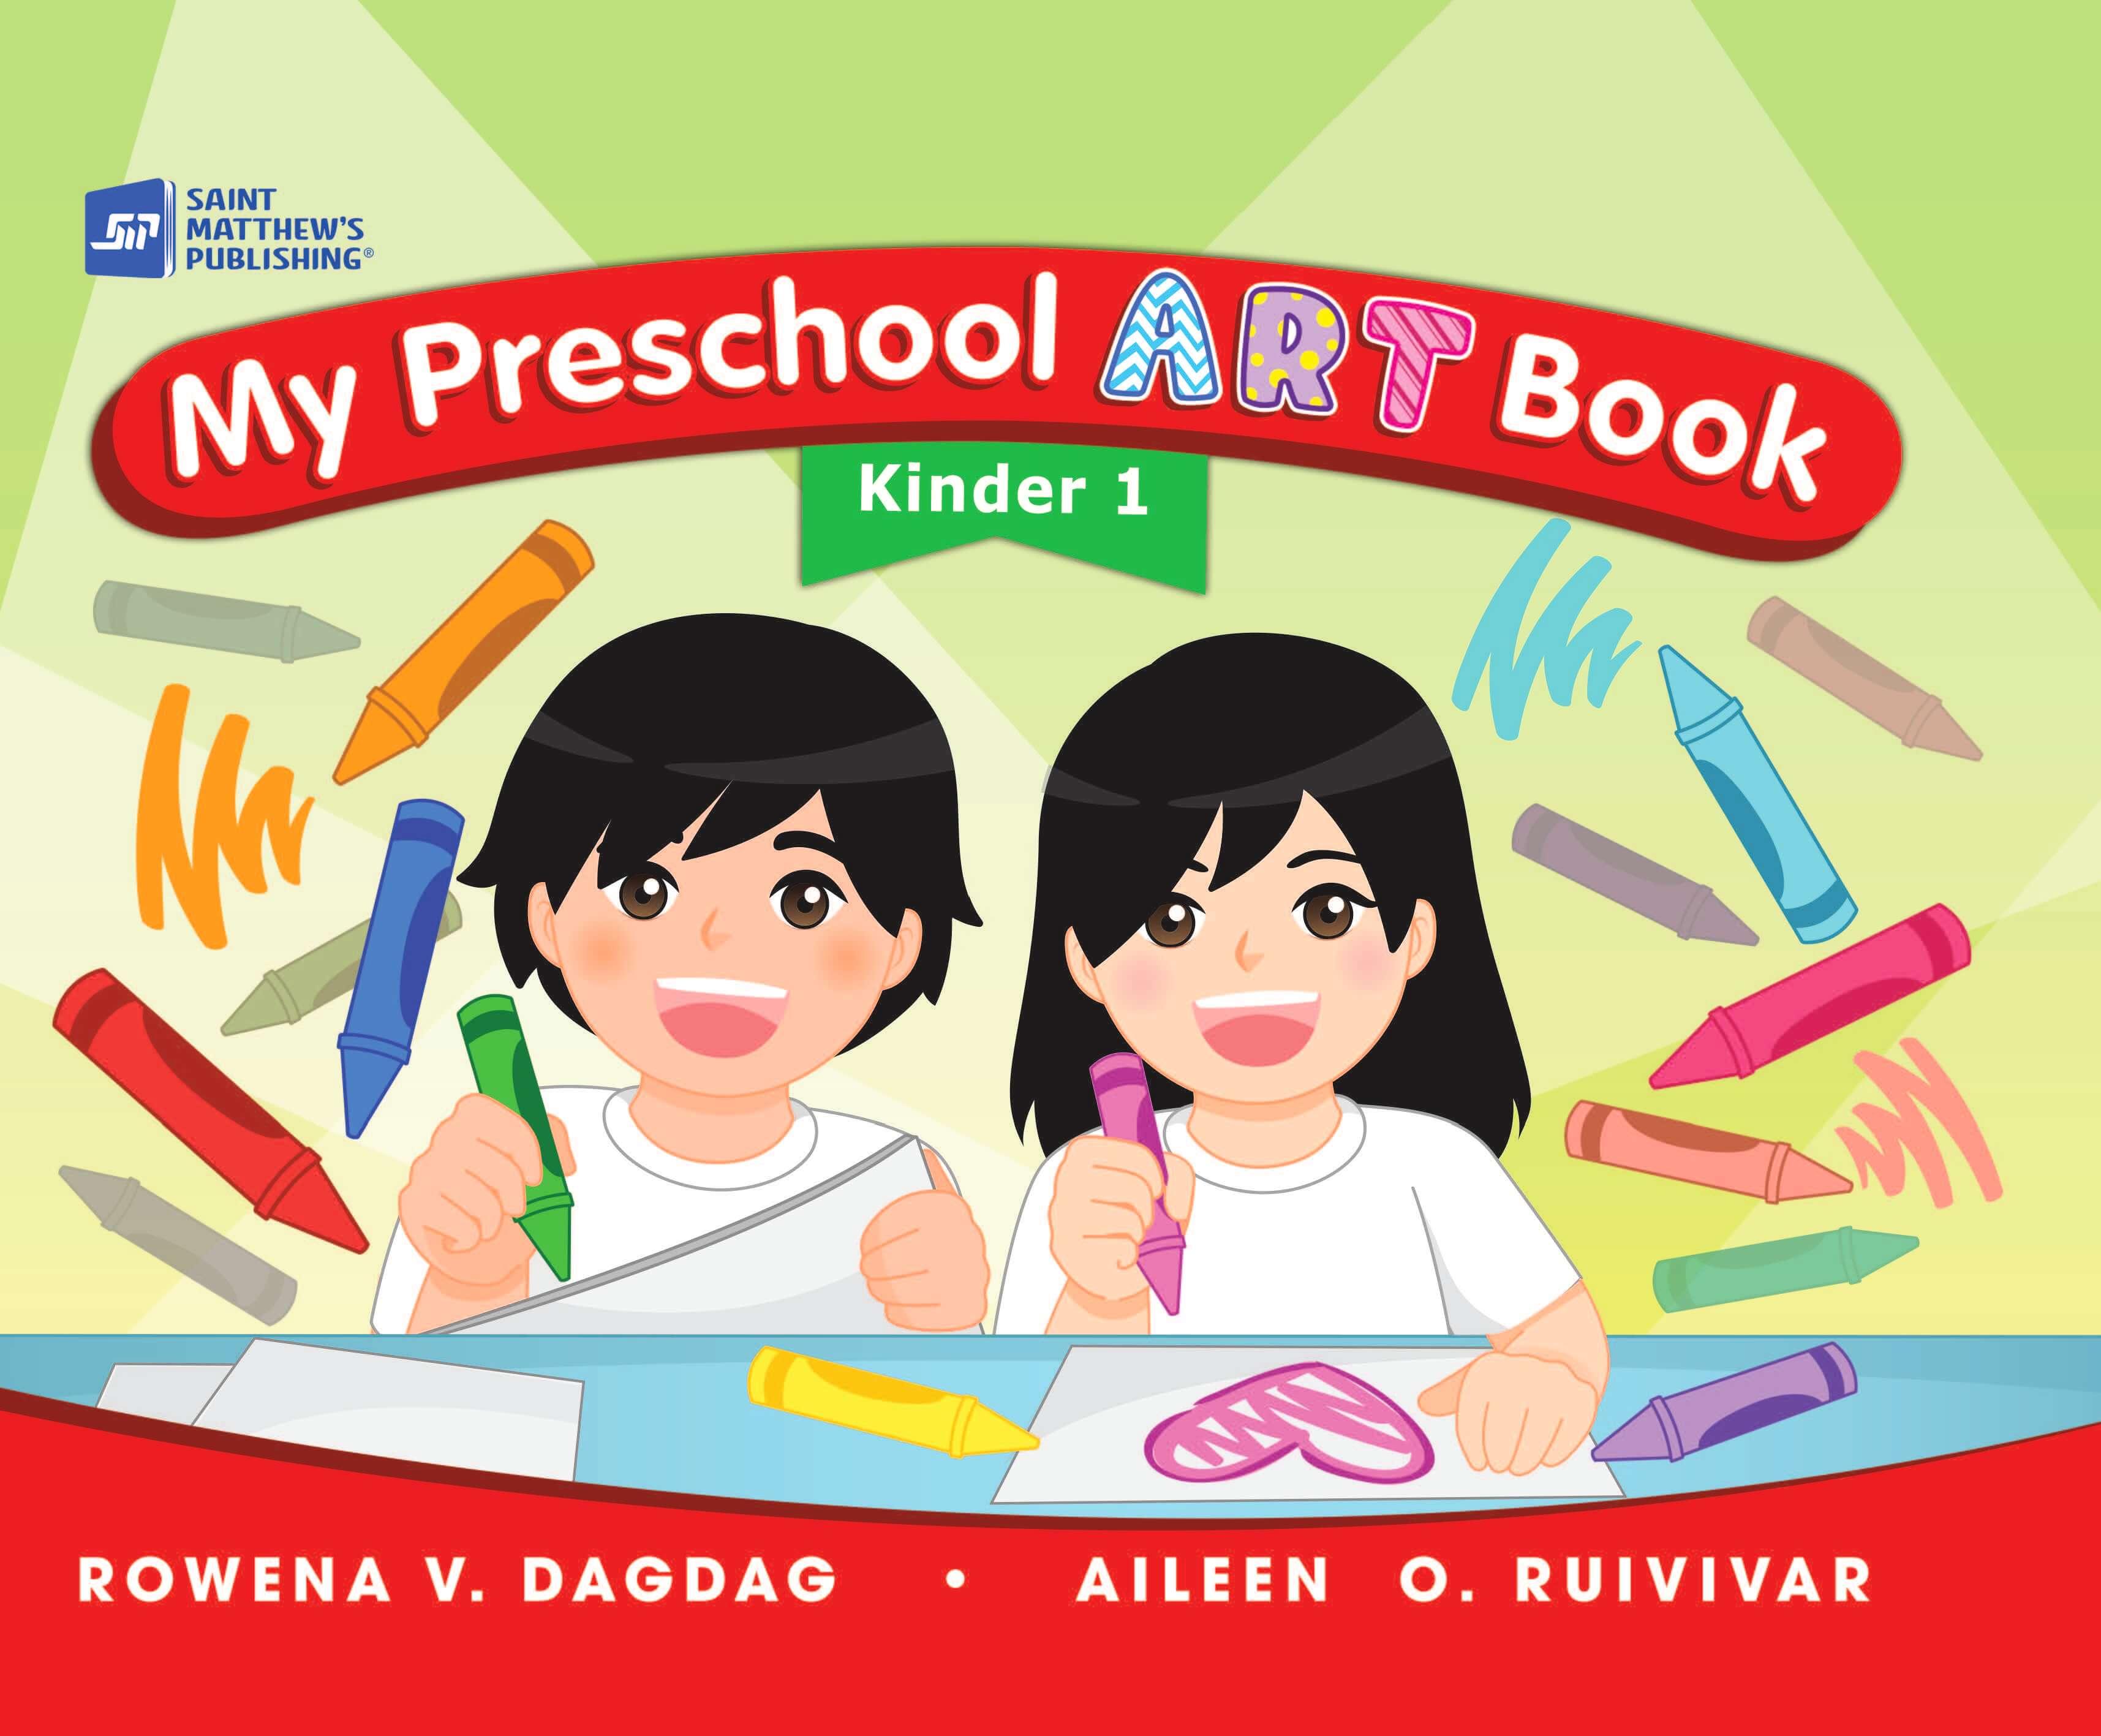 My art kinder st. Textbook clipart preschool book